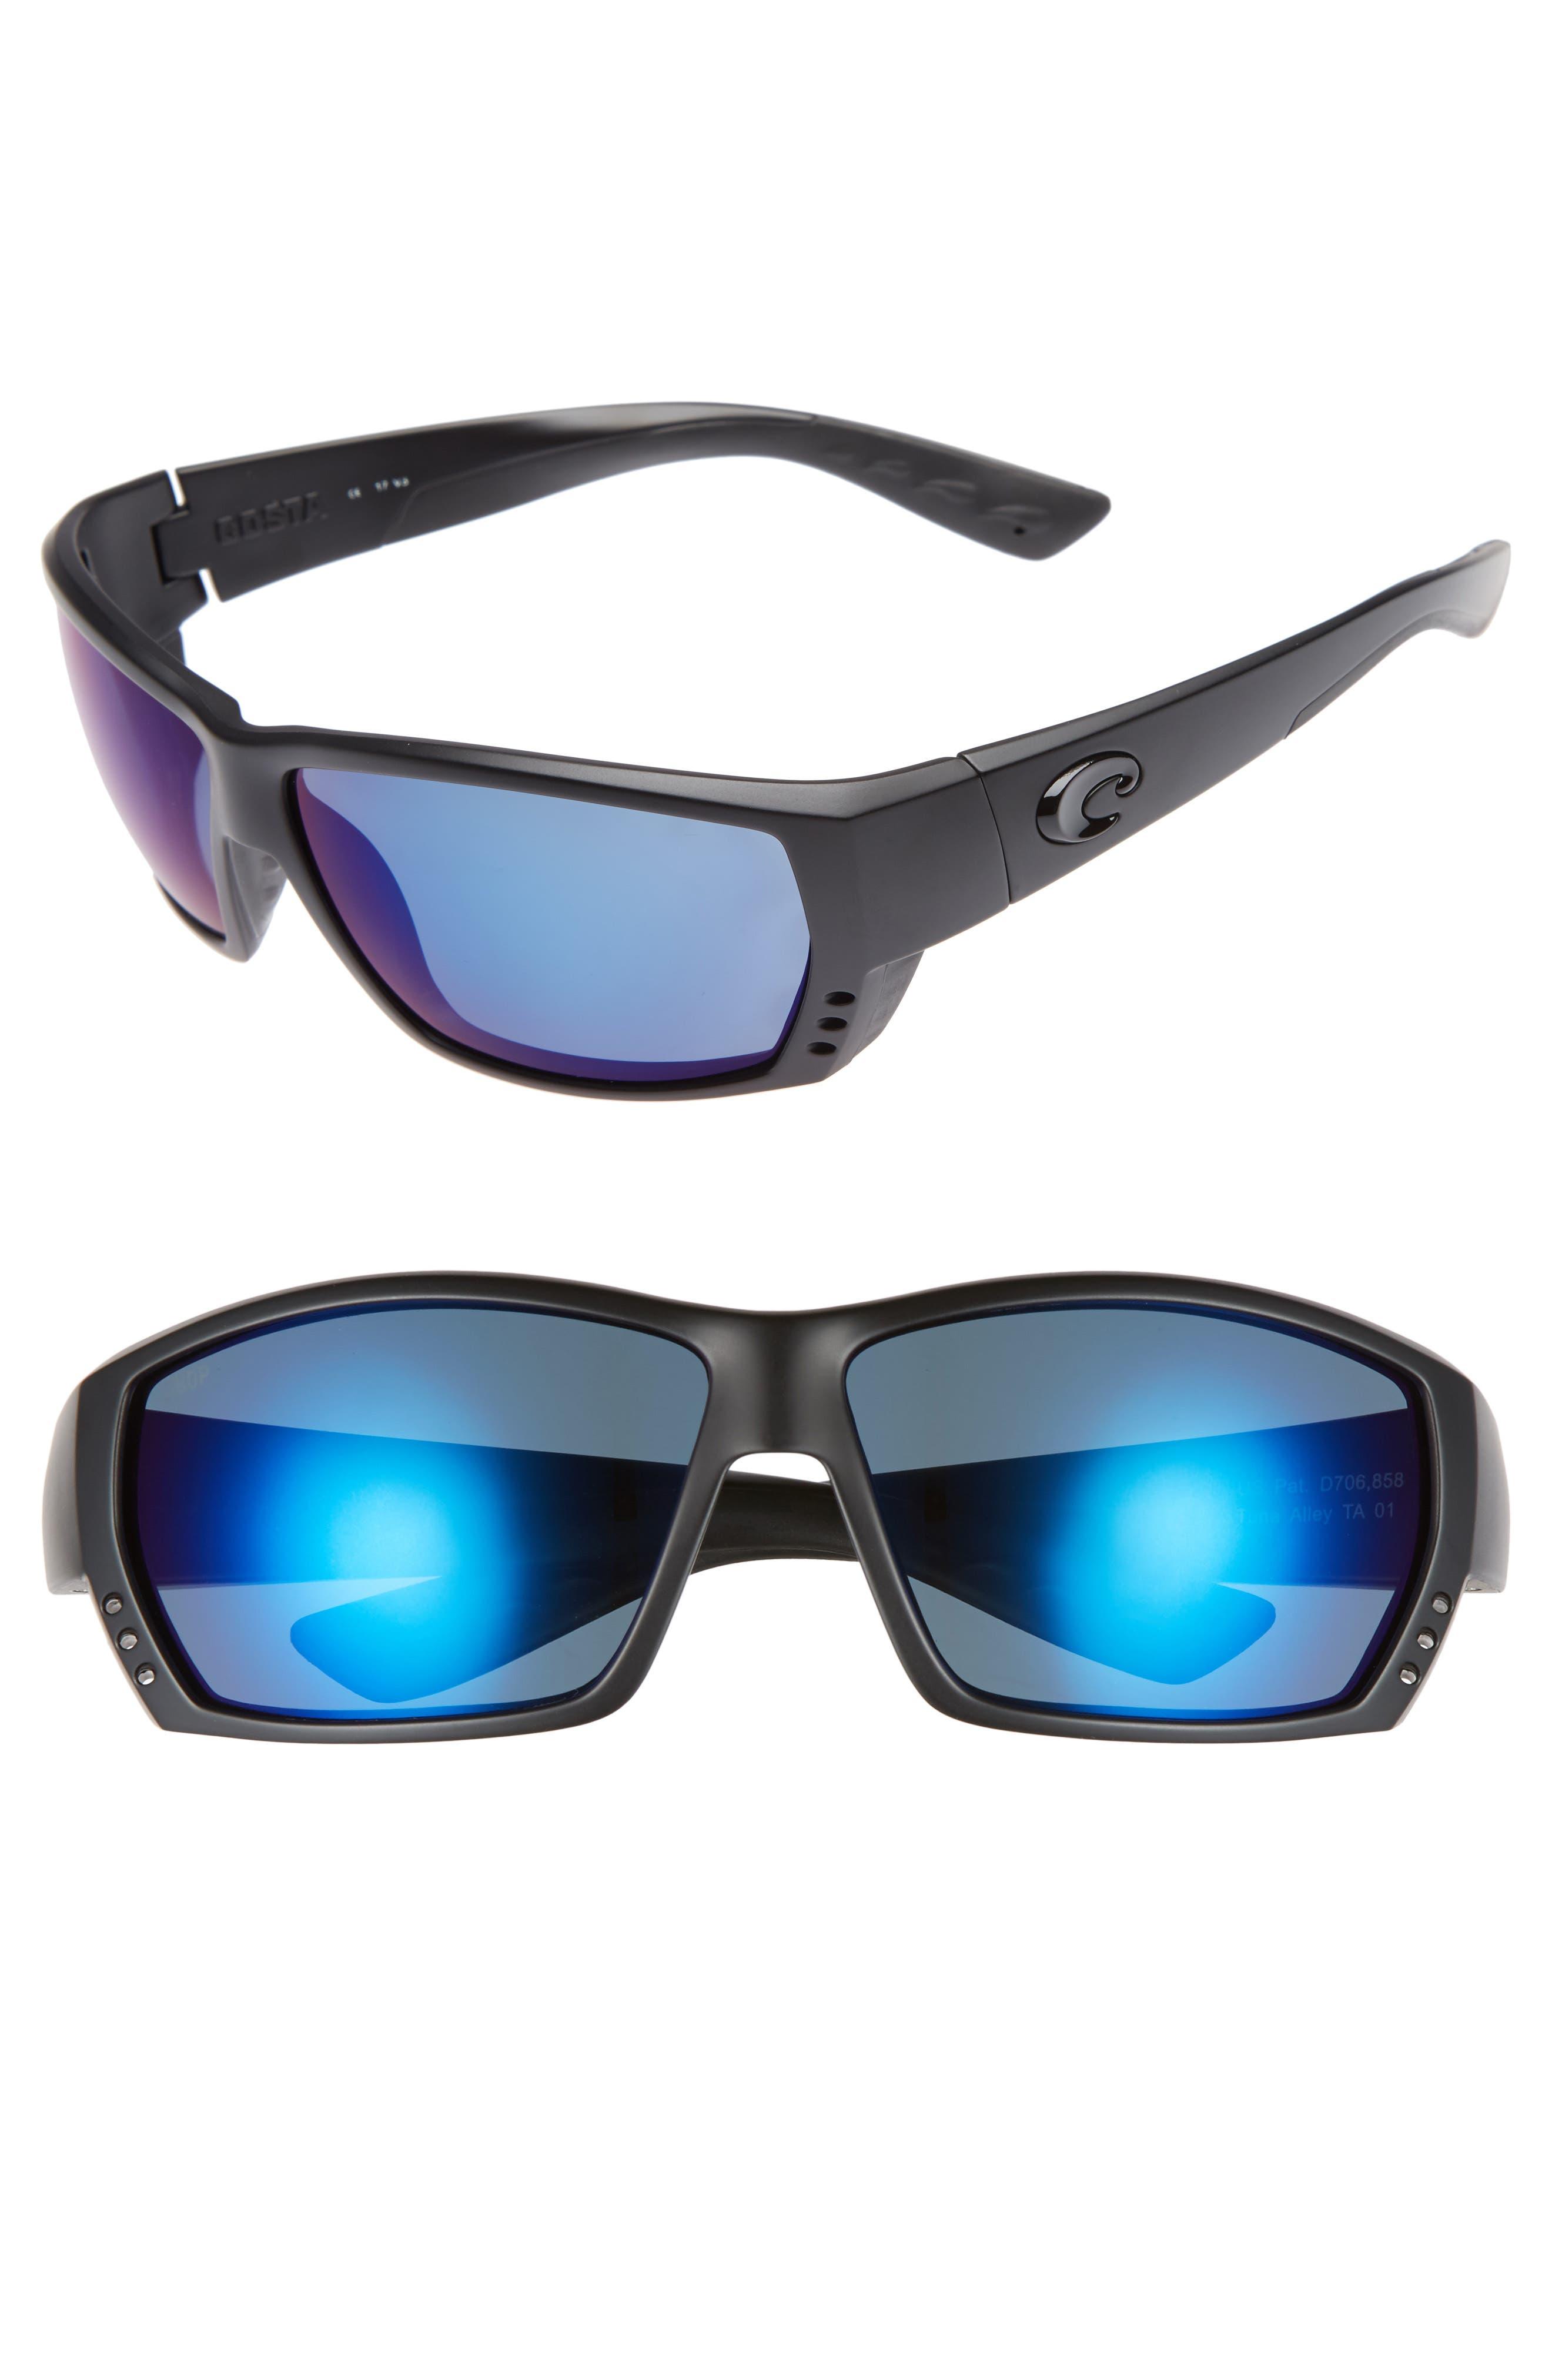 Tuna Alley 60mm Polarized Sunglasses,                         Main,                         color, Blackout/ Blue Mirror